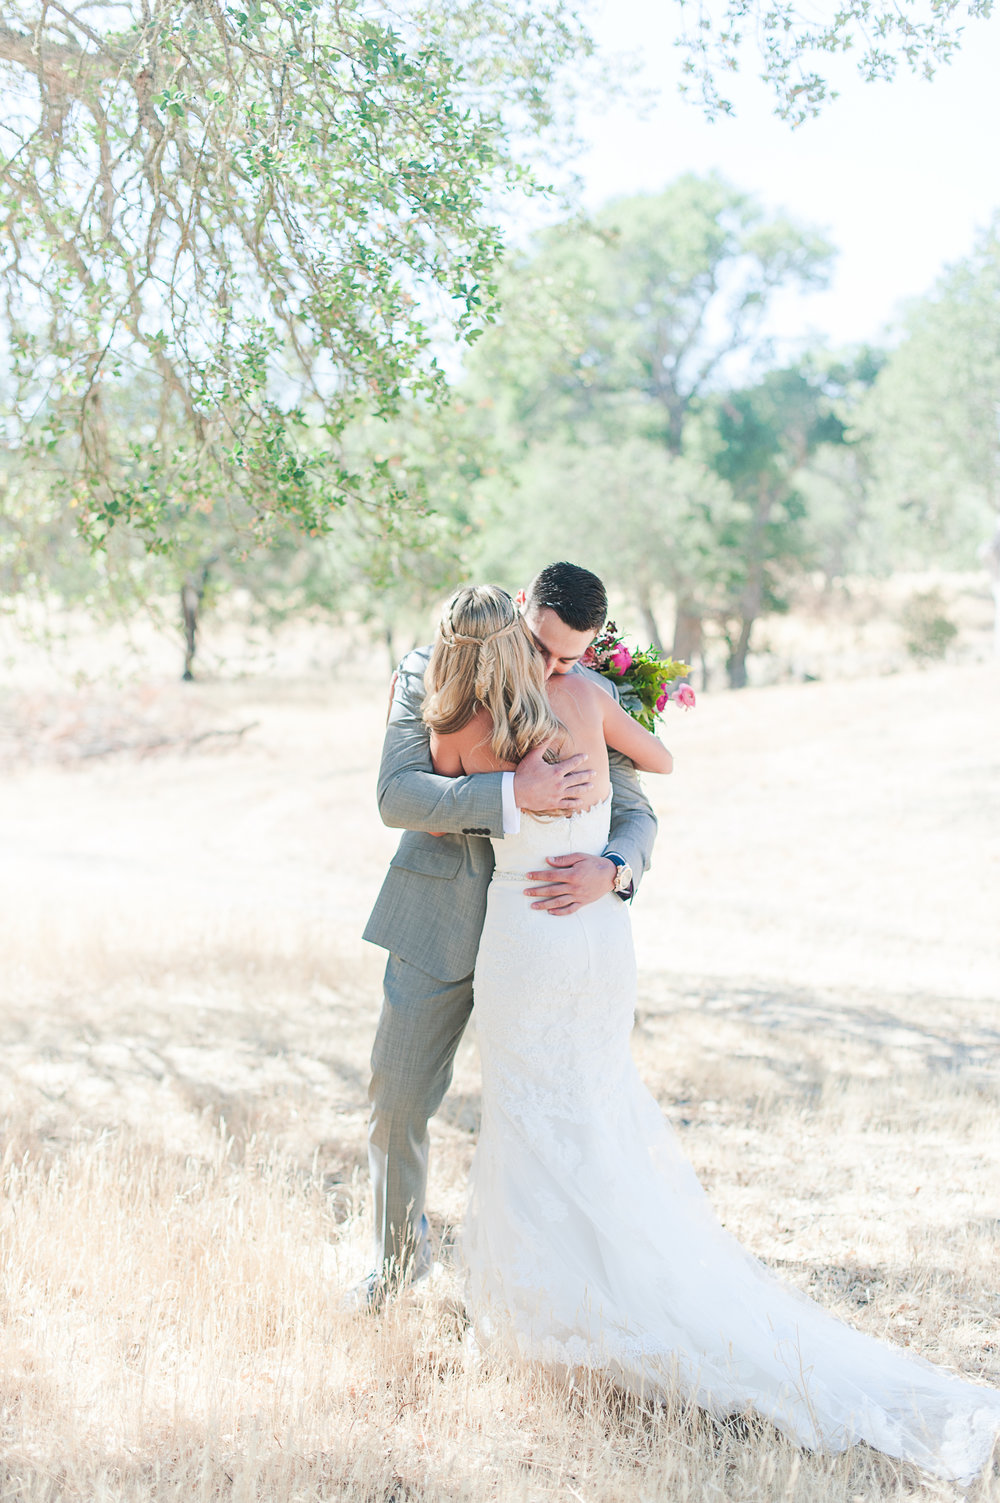 WeddingPortfolio0005.jpg